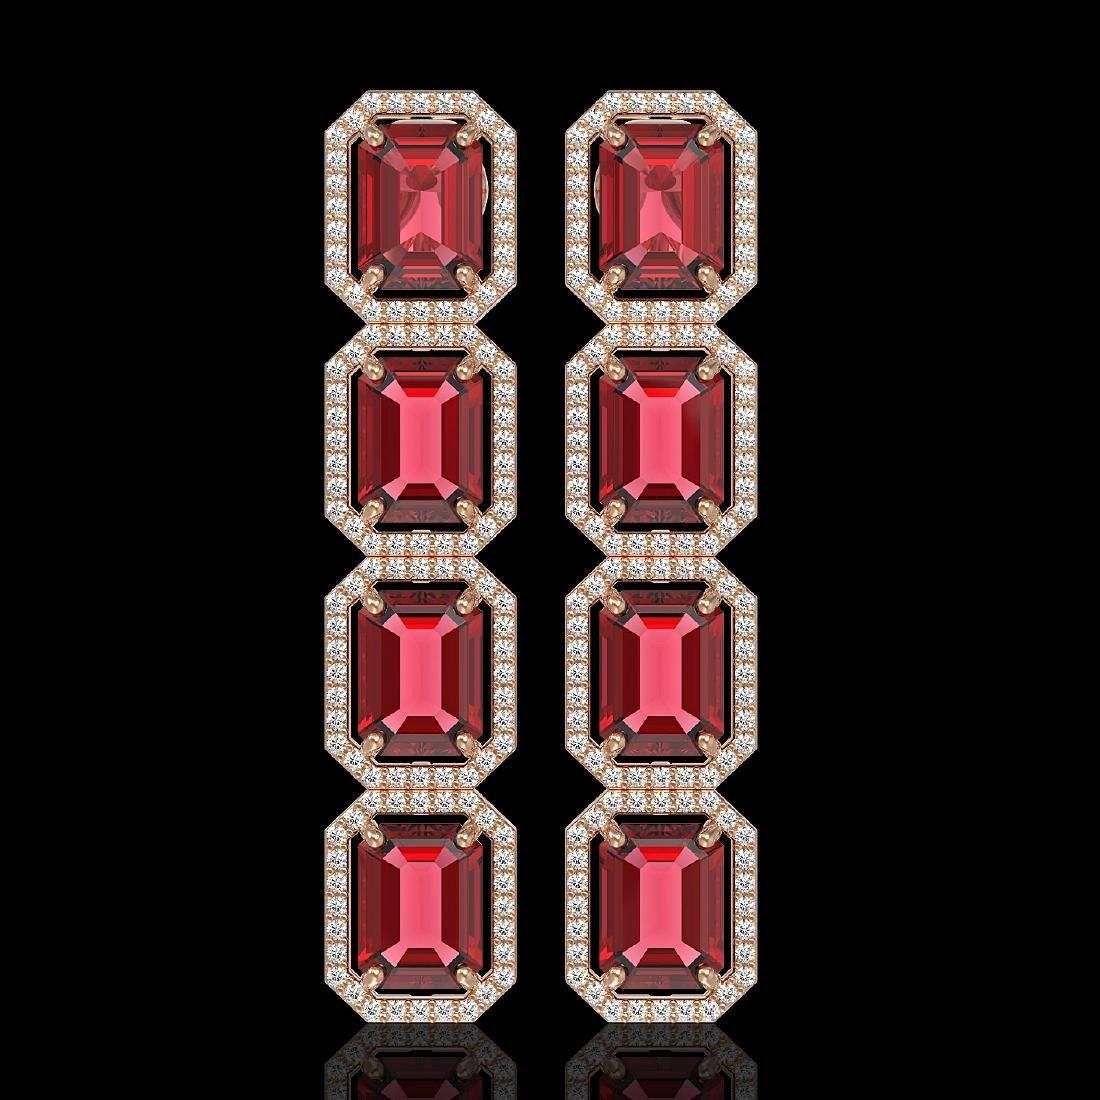 19.44 CTW Tourmaline & Diamond Halo Earrings 10K Rose